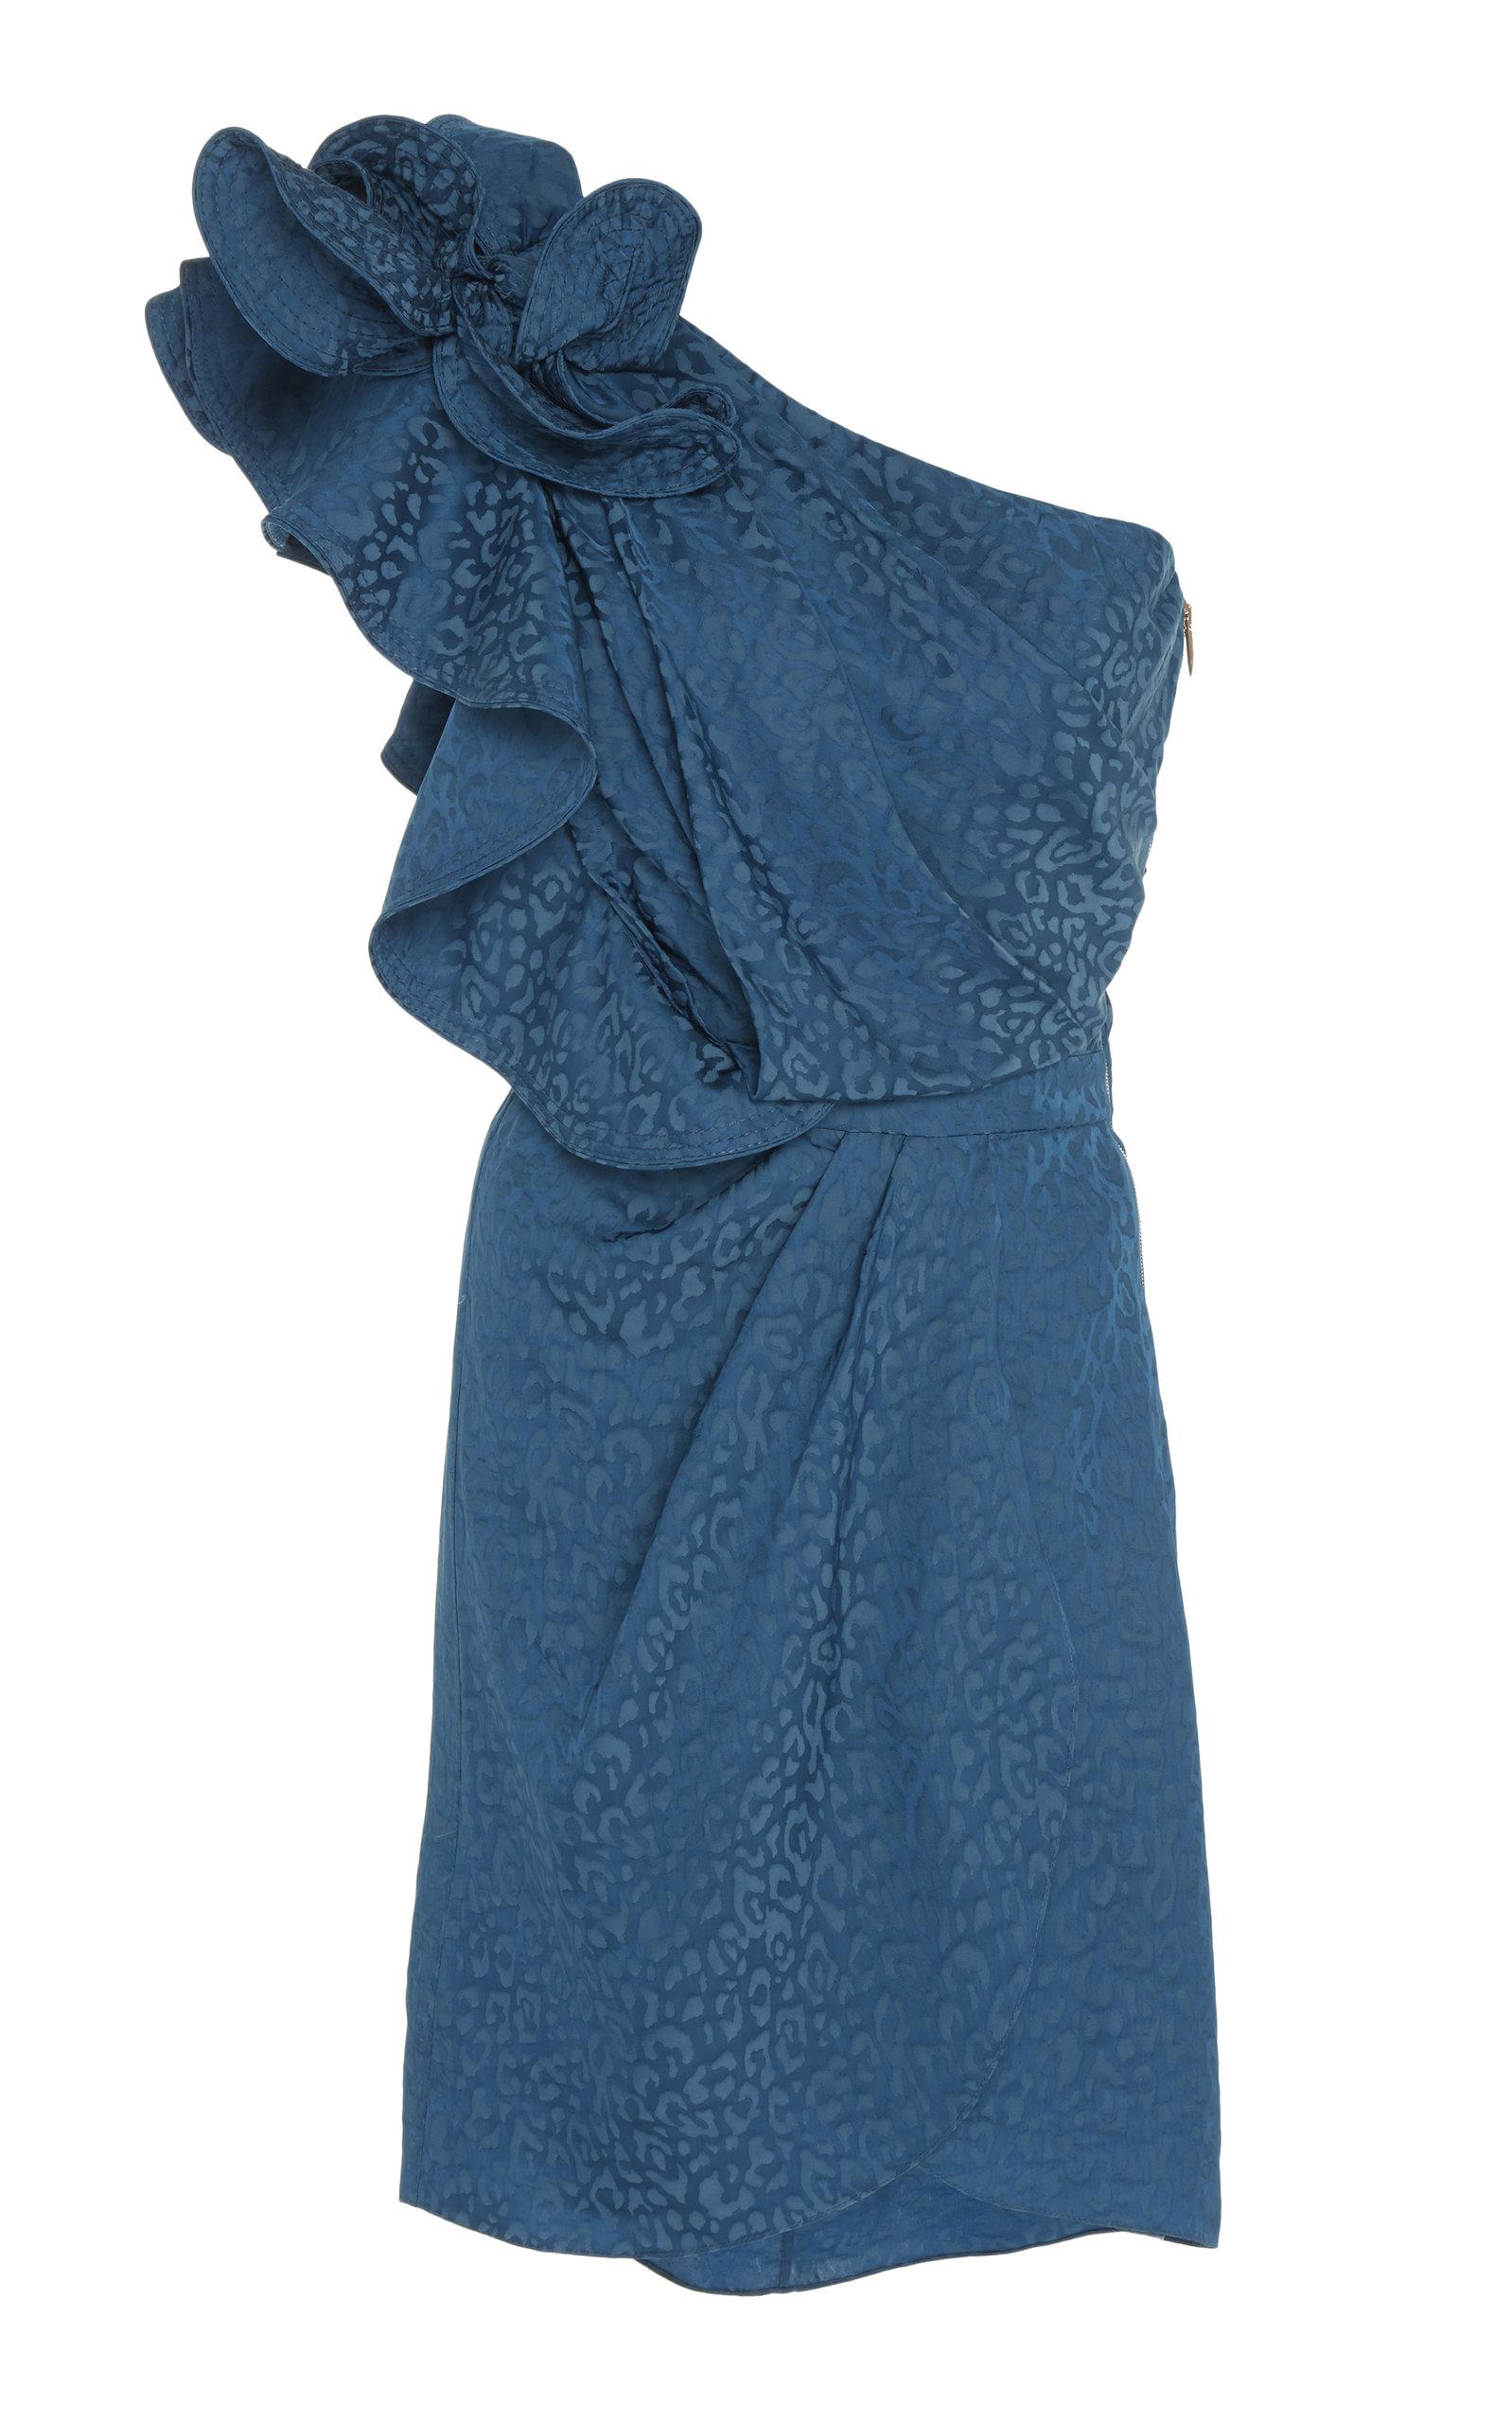 Oponent Interpretation One Shoulder Satin Jacquard Mini Dress by Johanna Ortiz